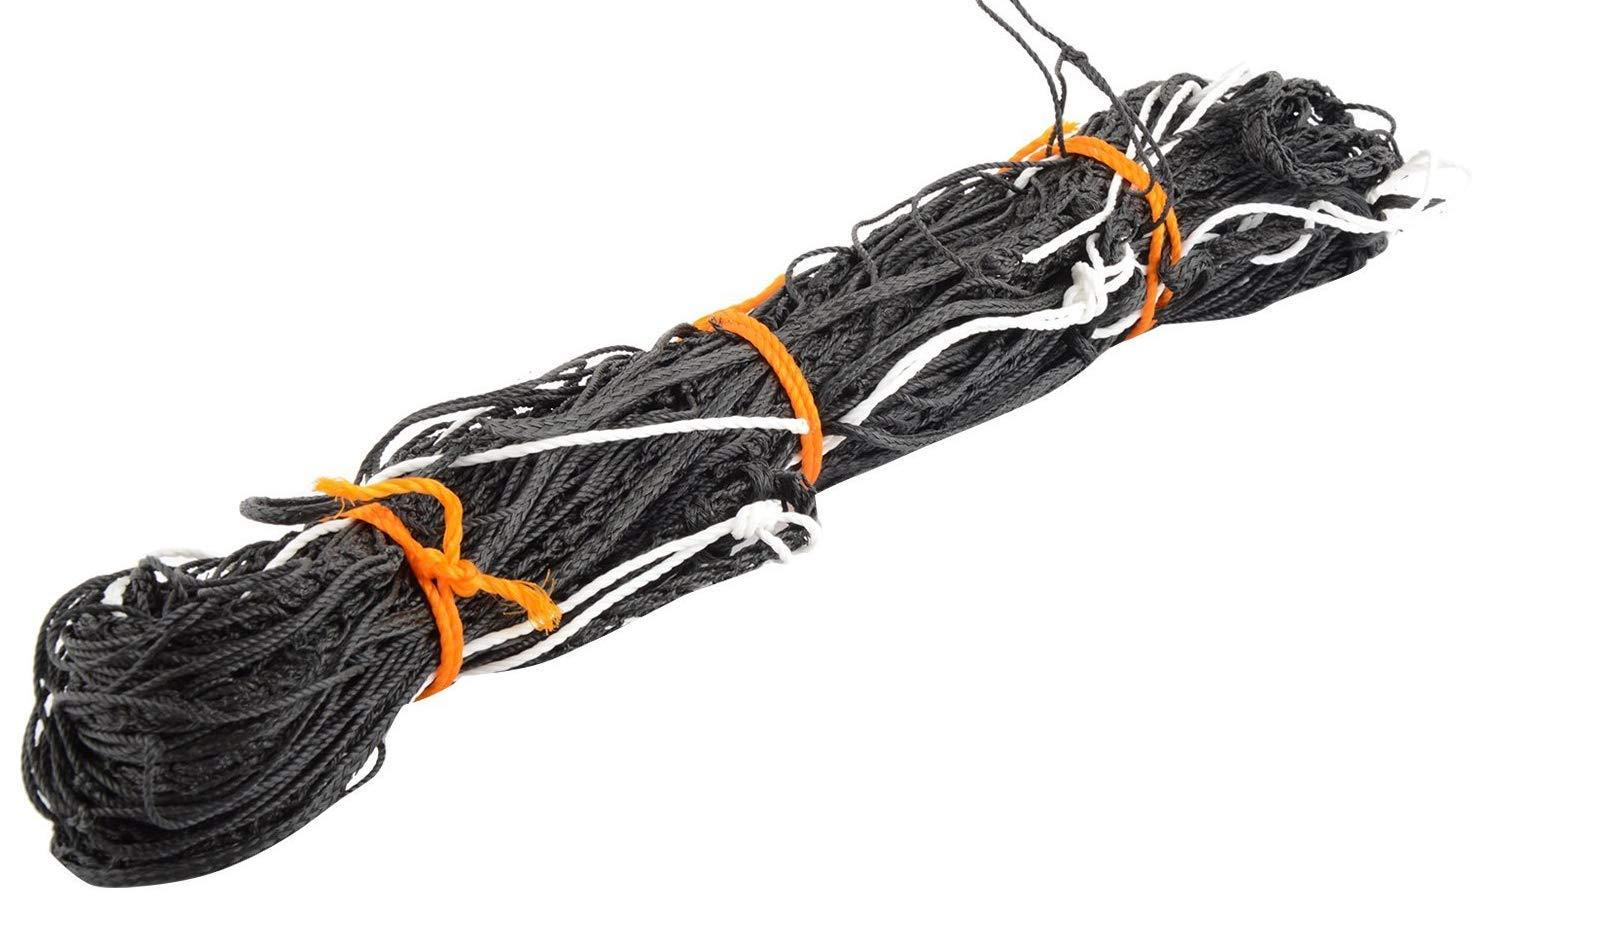 YUVAGREEN Evergreen Plant Climbing Net (3 X 1.5 m, Black) (B07KZGCKZT) Amazon Price History, Amazon Price Tracker